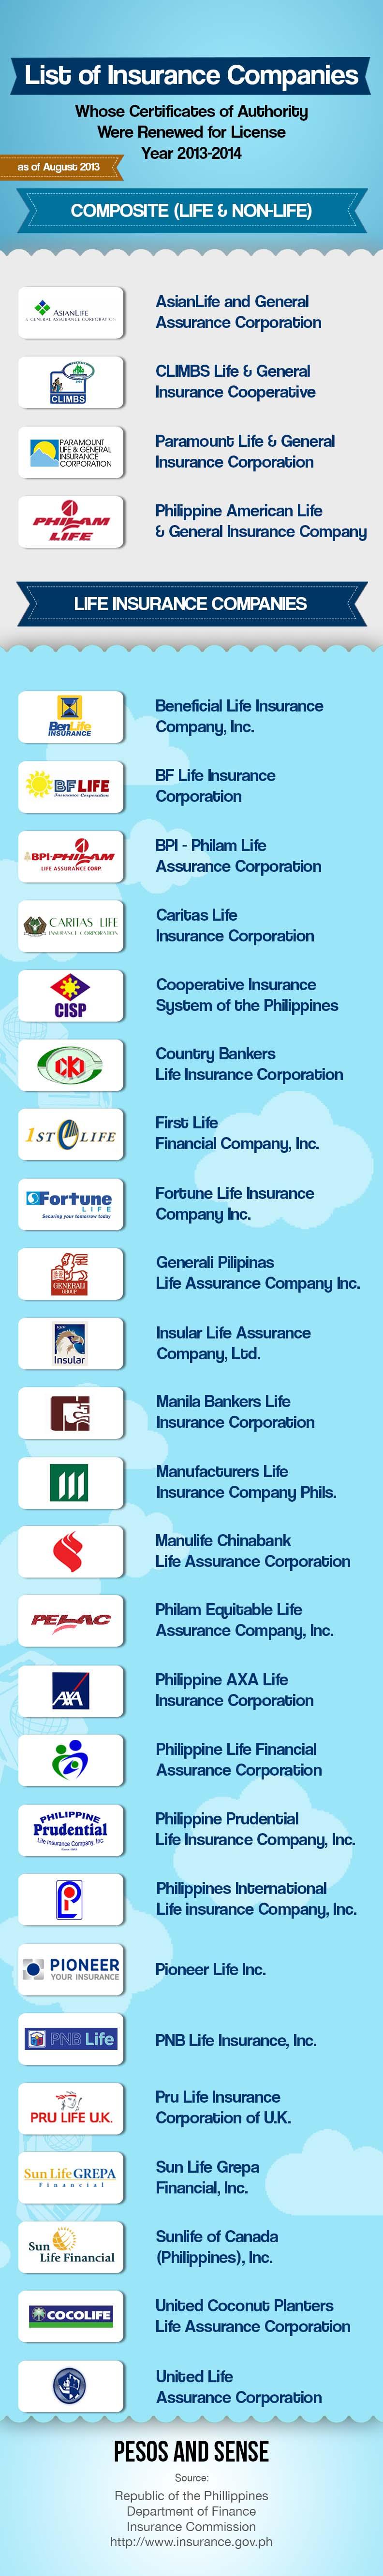 List of Insurance Companies